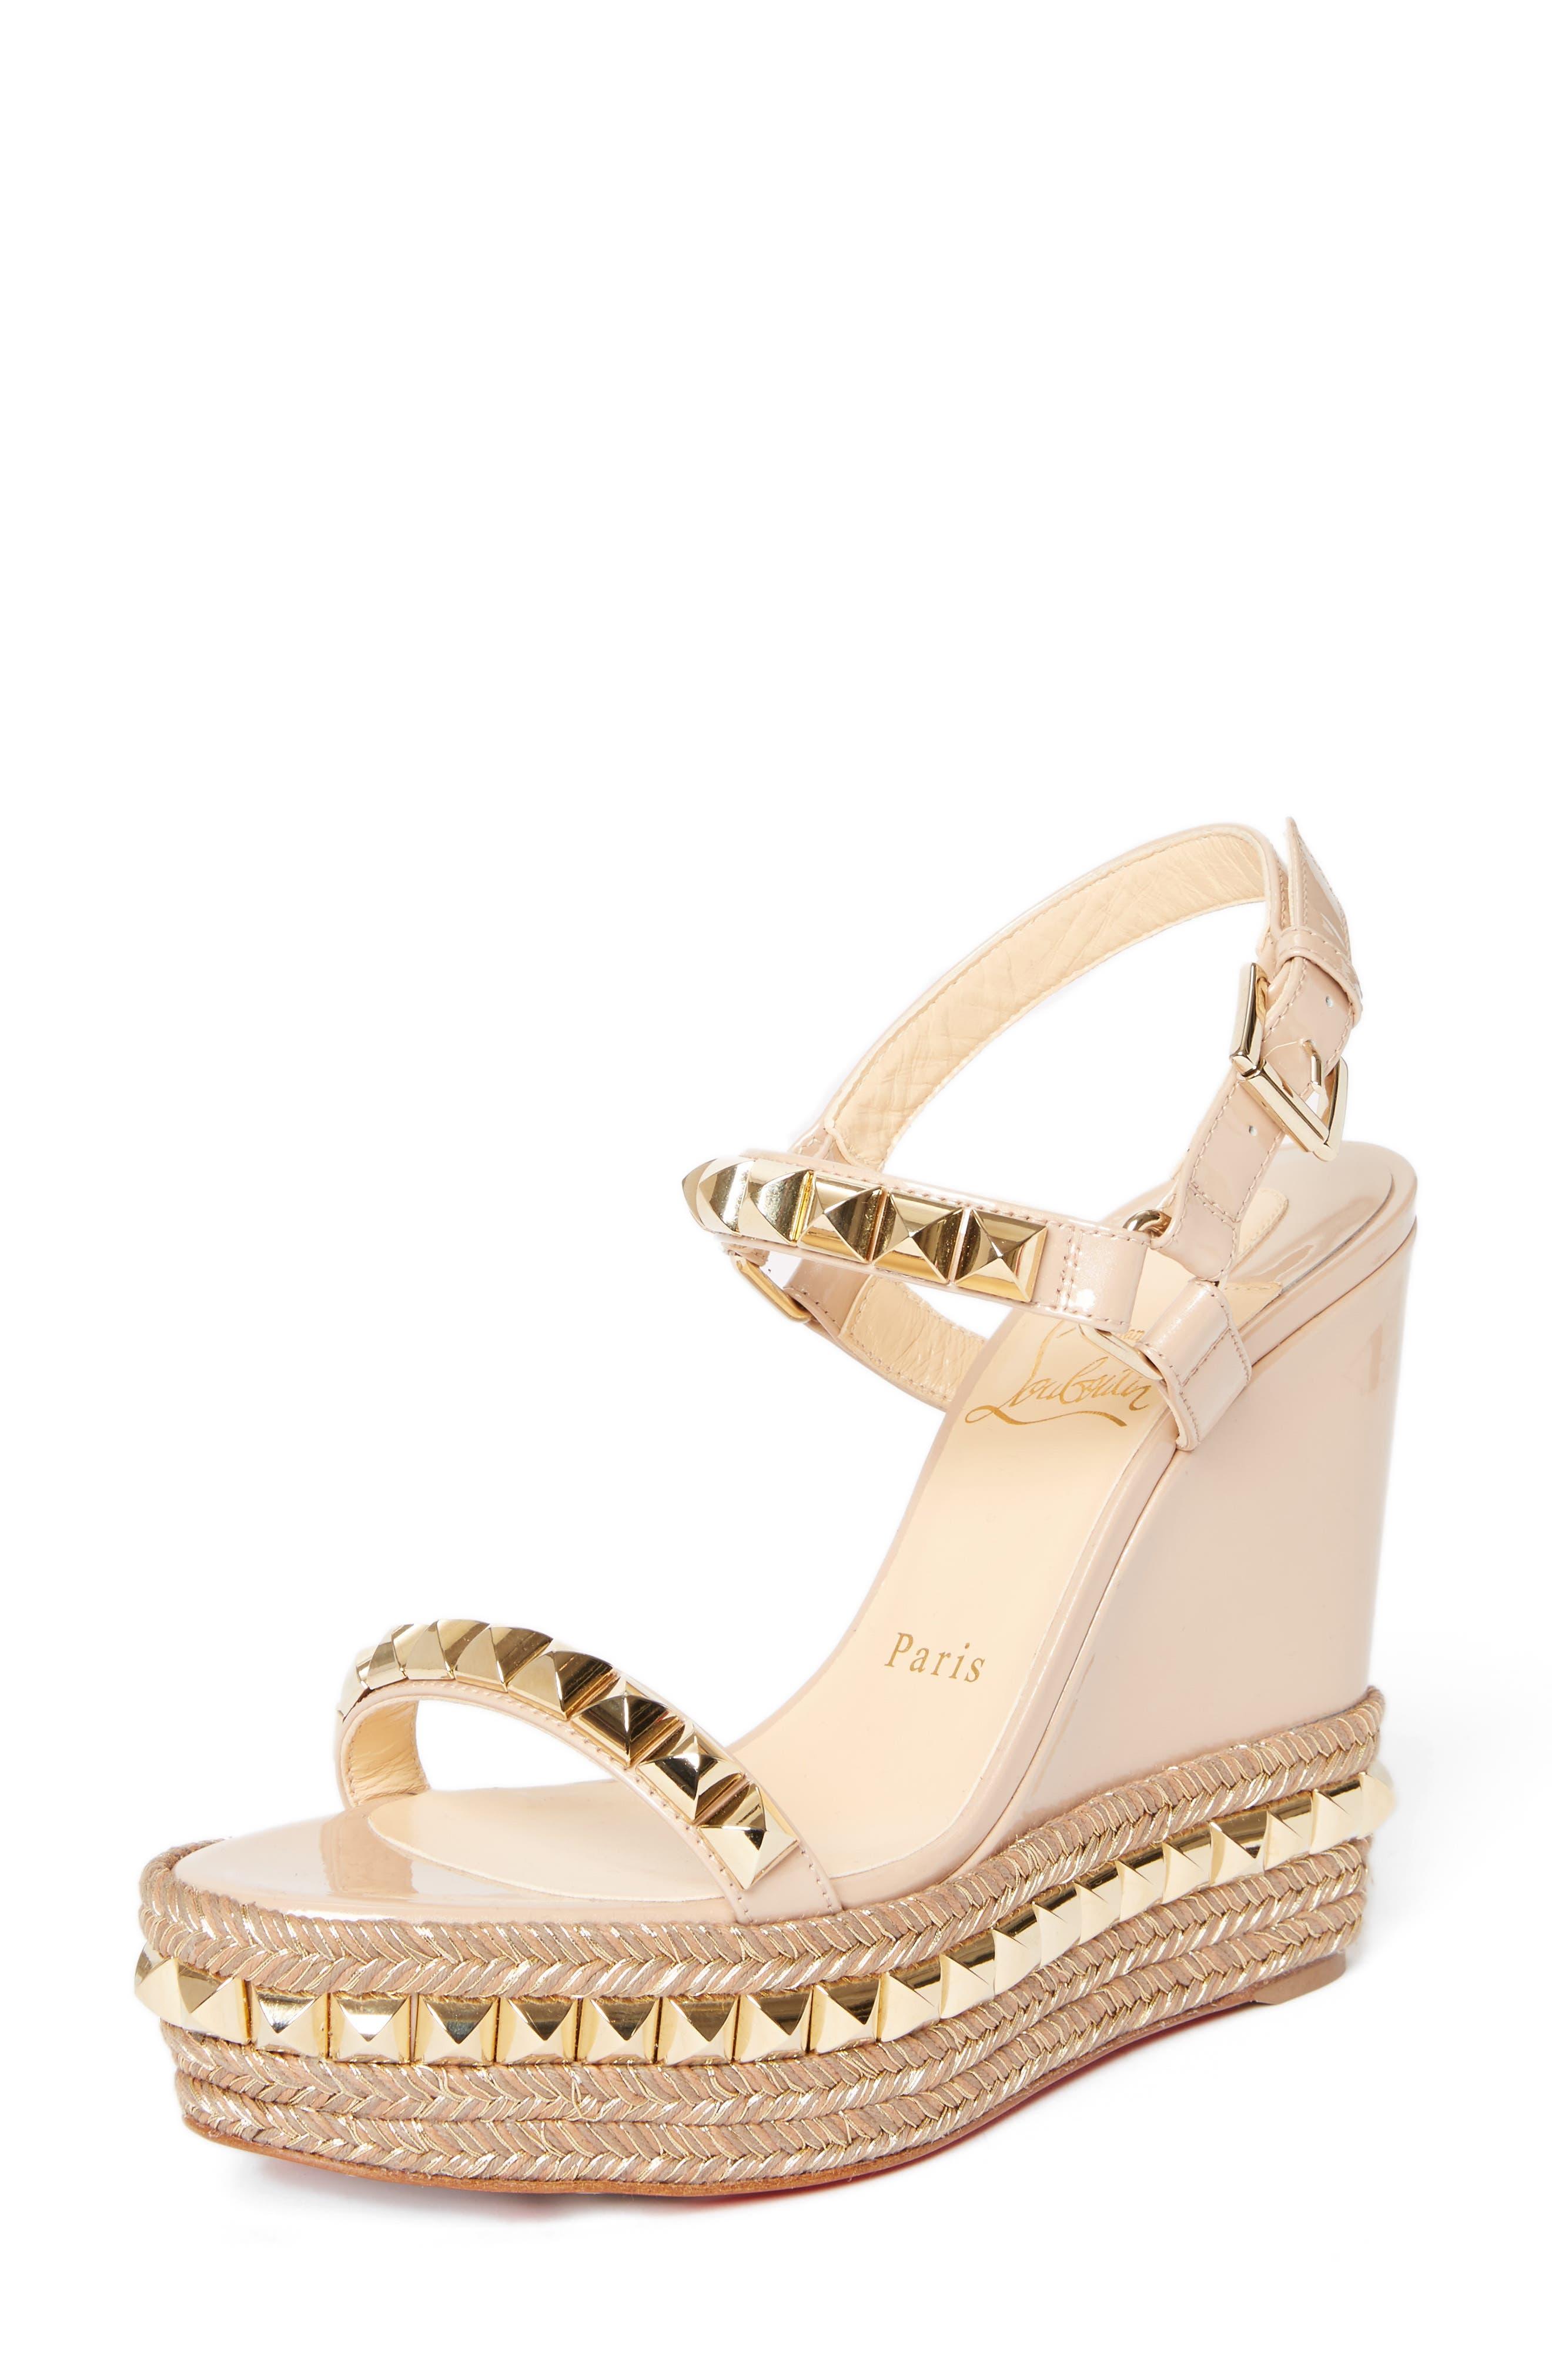 Cataclou Espadrille Wedge Sandal,                         Main,                         color, Nude/ Gold